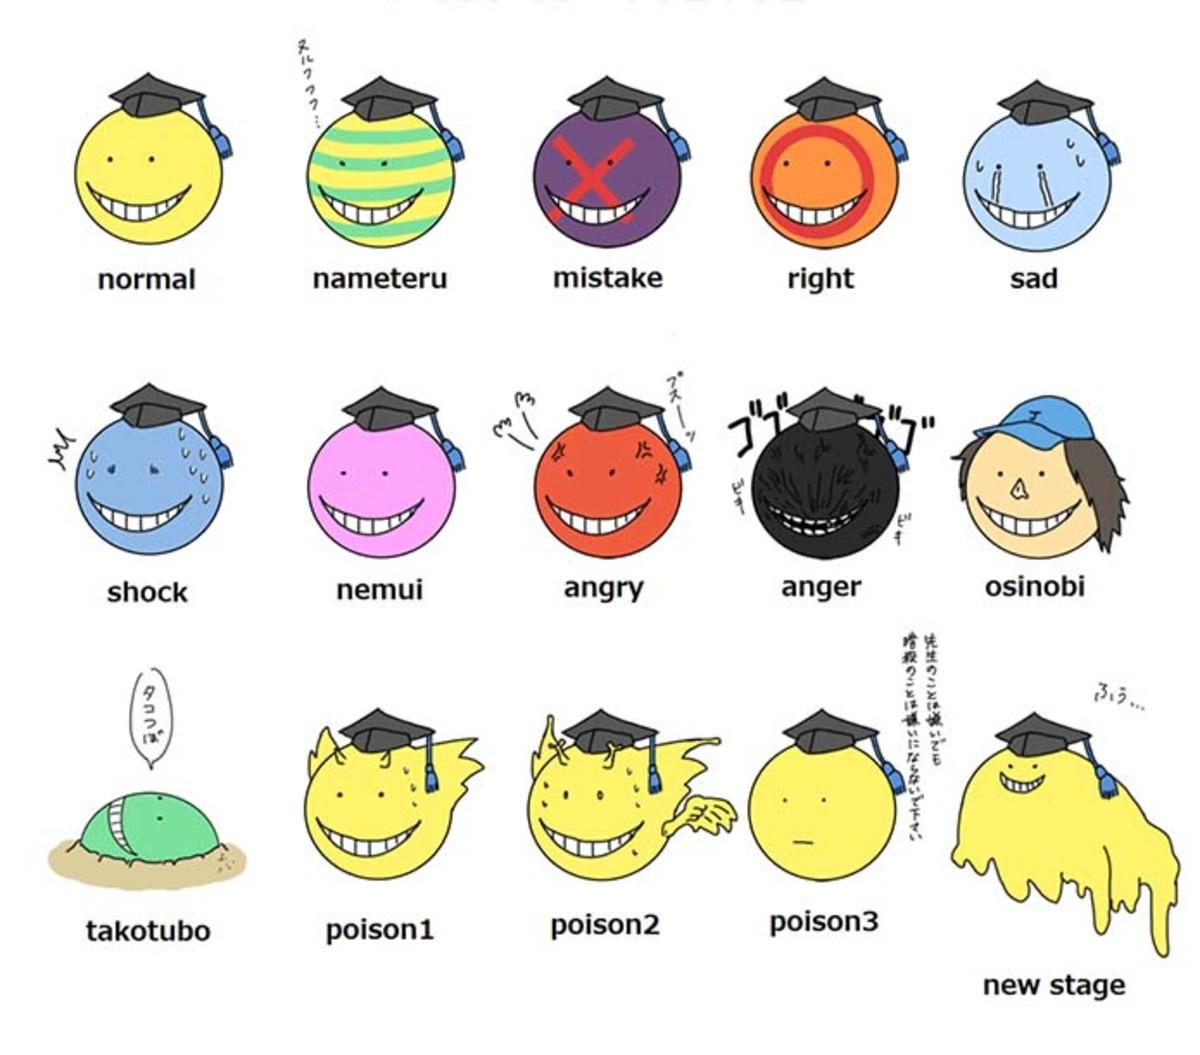 Korosensei's moods and emotions.